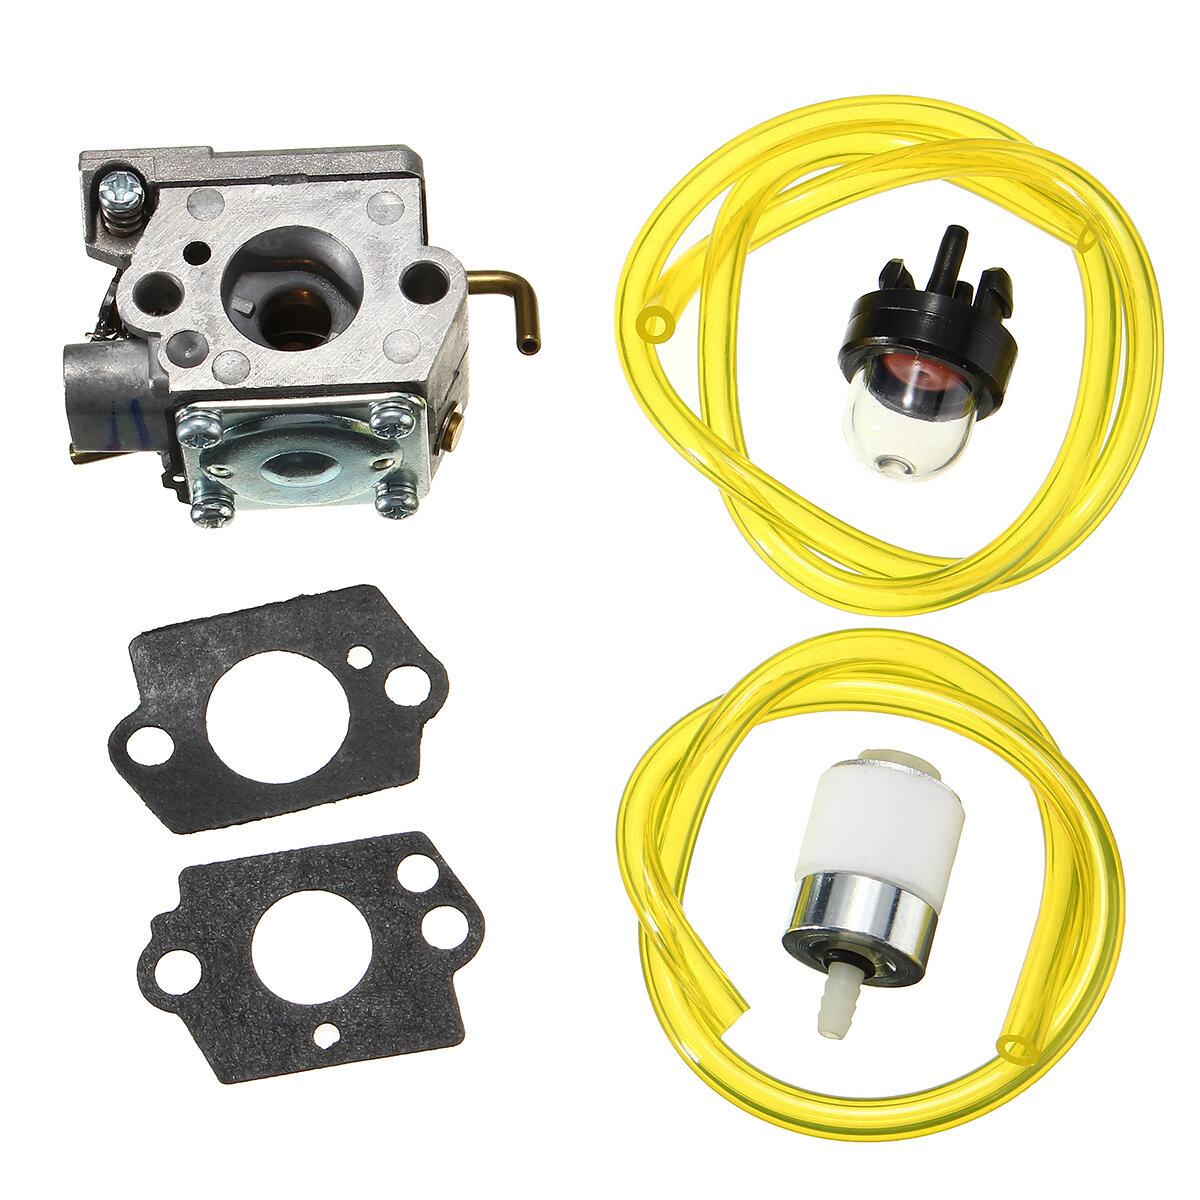 Carburetor Primer Bulb Gaskets Filter para Walbro WT-682-1 WT-682 Troy-bilt TB65SS Trimmr MTD Ryobi